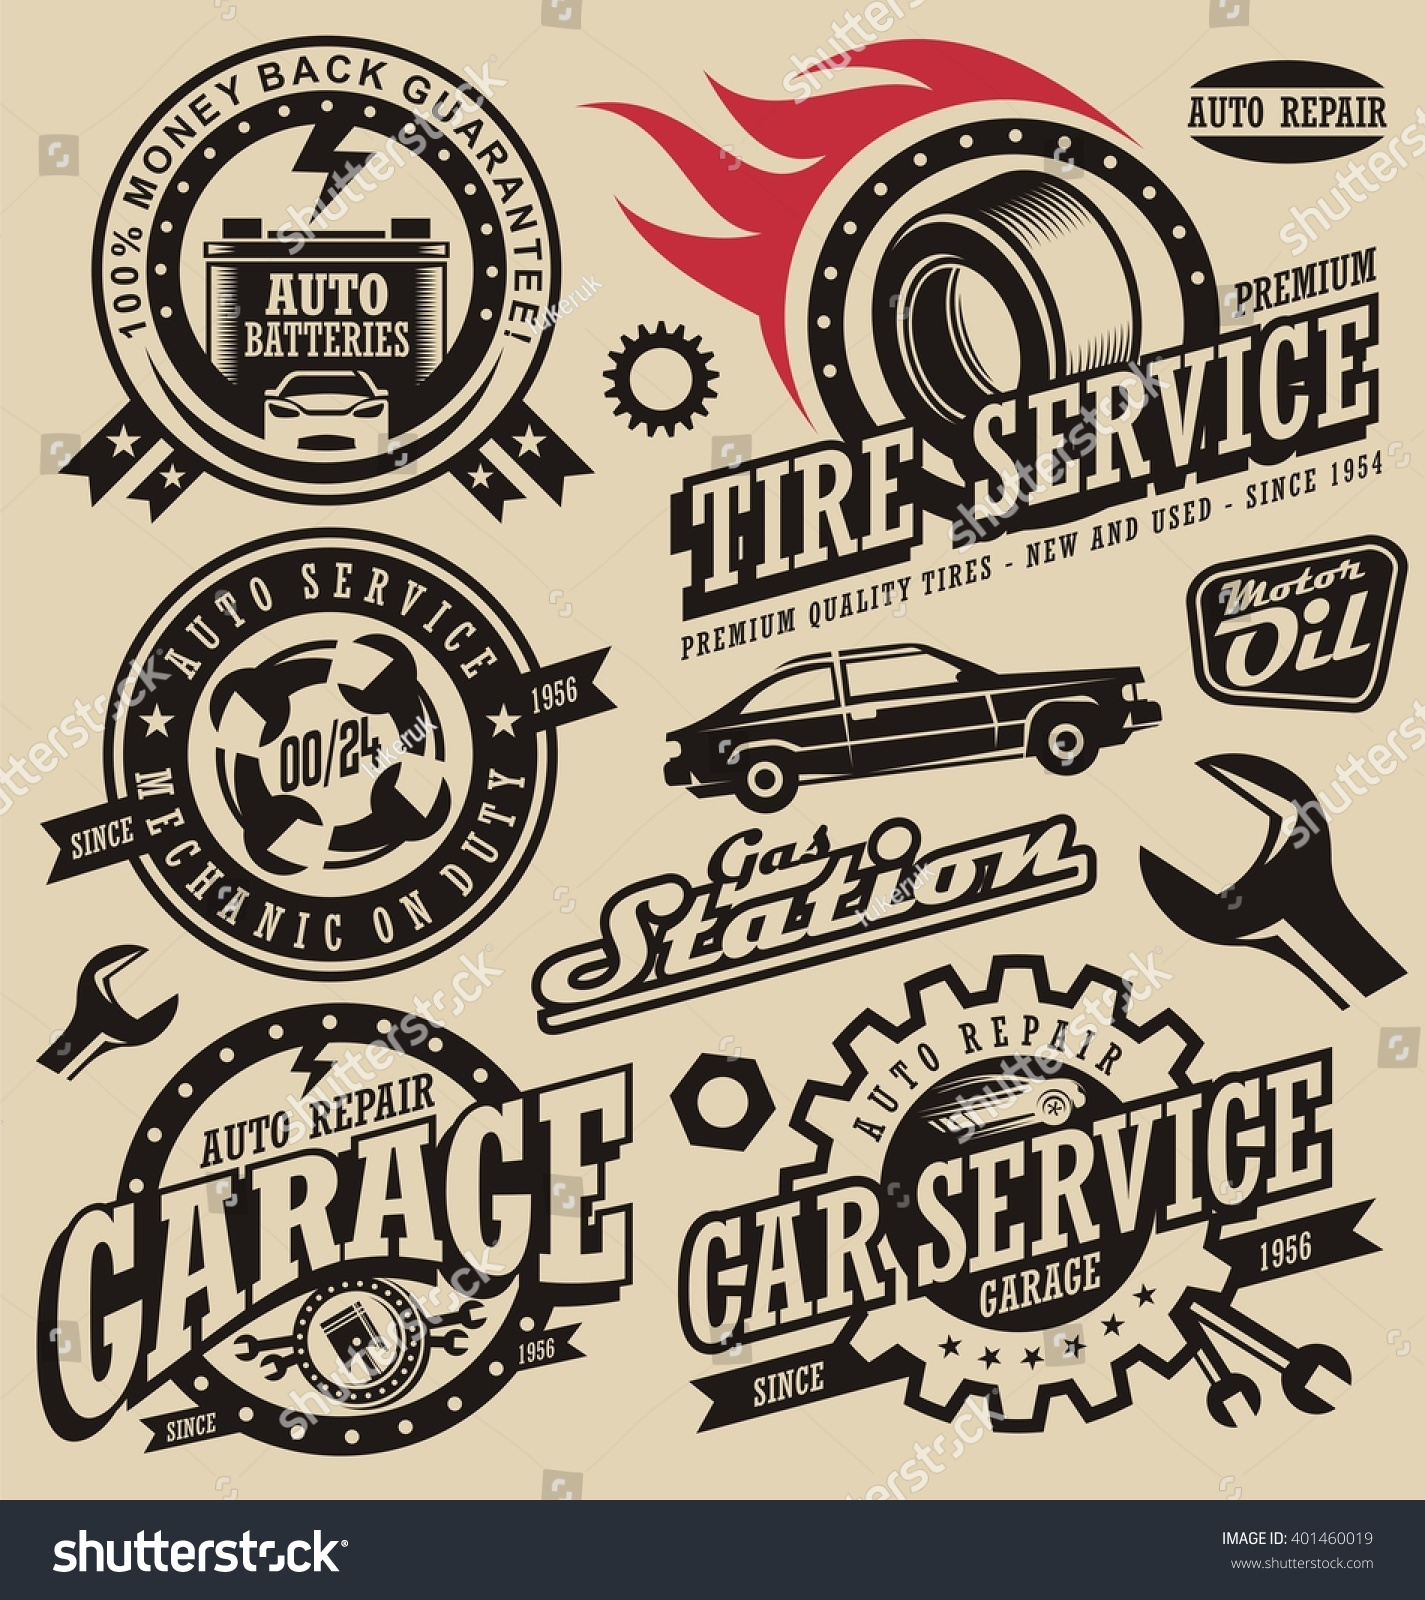 Car Service Symbols Auto Engine Parts Stock Vector 401460019 ...